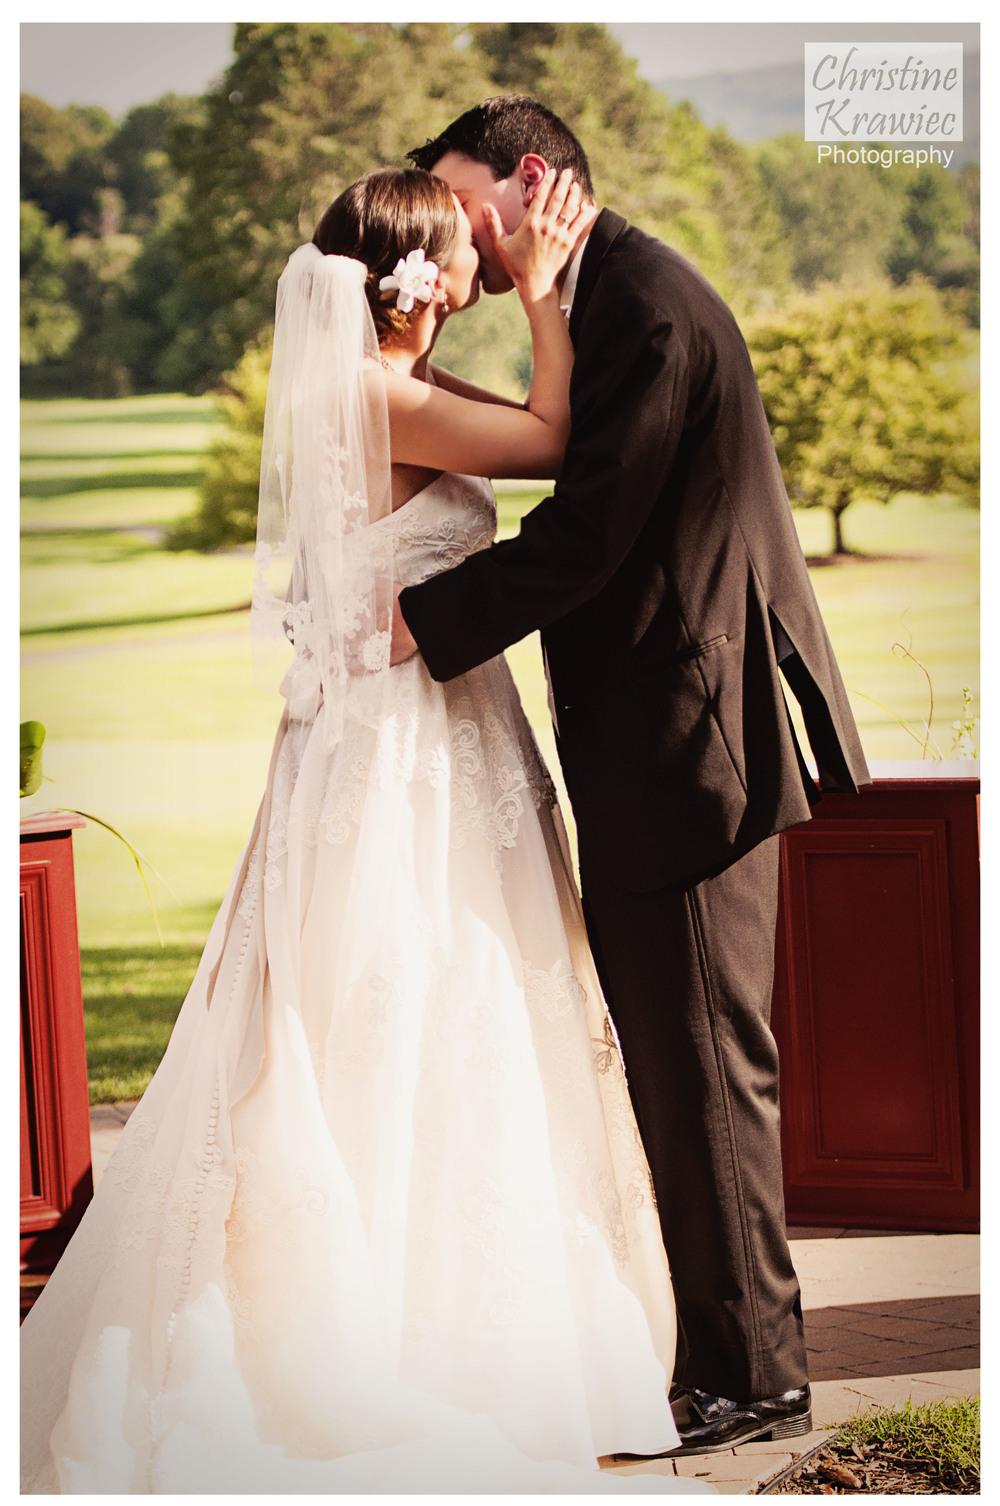 Christine Krawiec Photography - Silver Creek Country Club Wedding Photographer